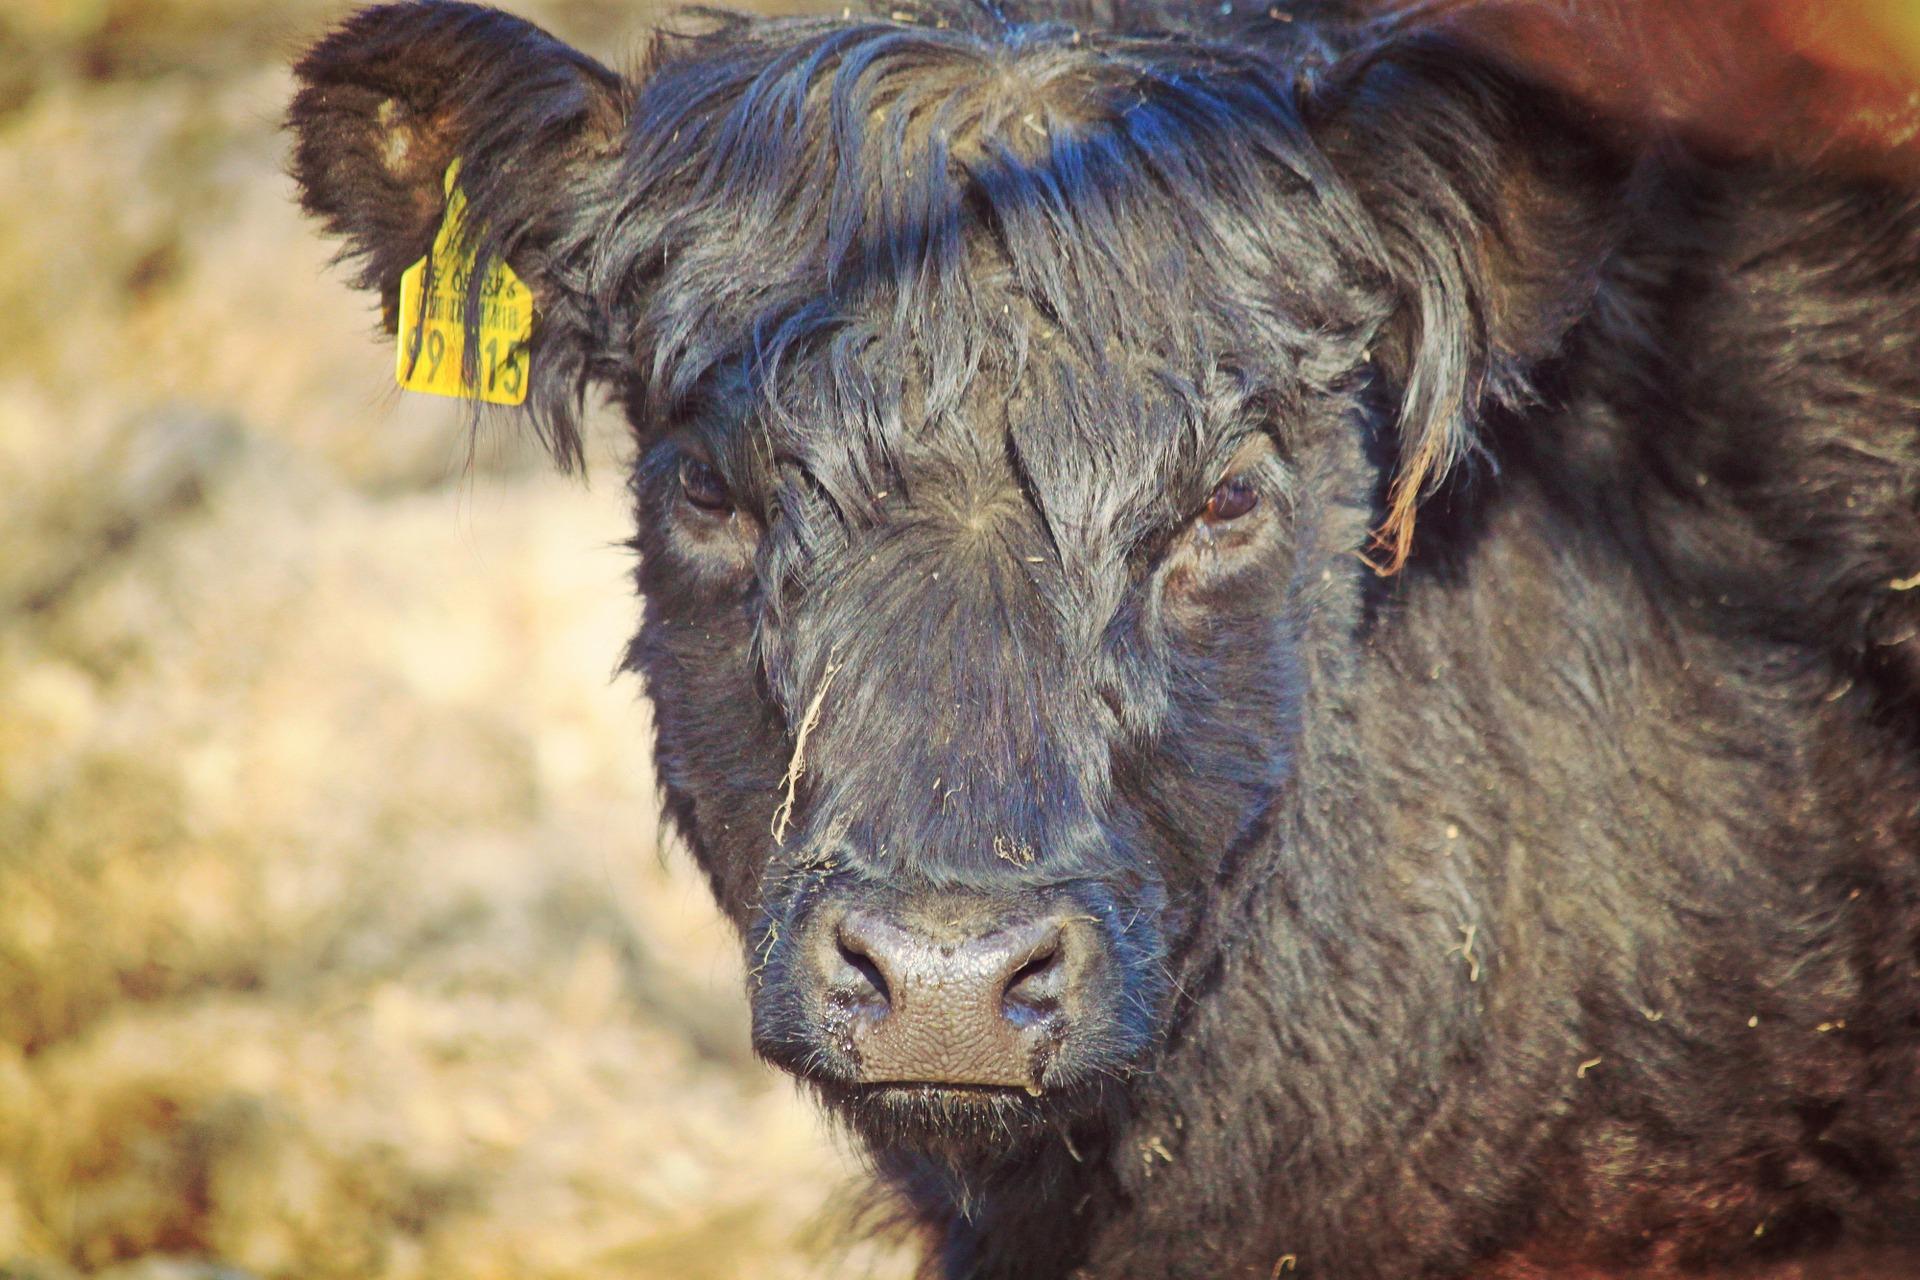 Black  Cow Staring, Farm, Cow, Black, Animal, HQ Photo